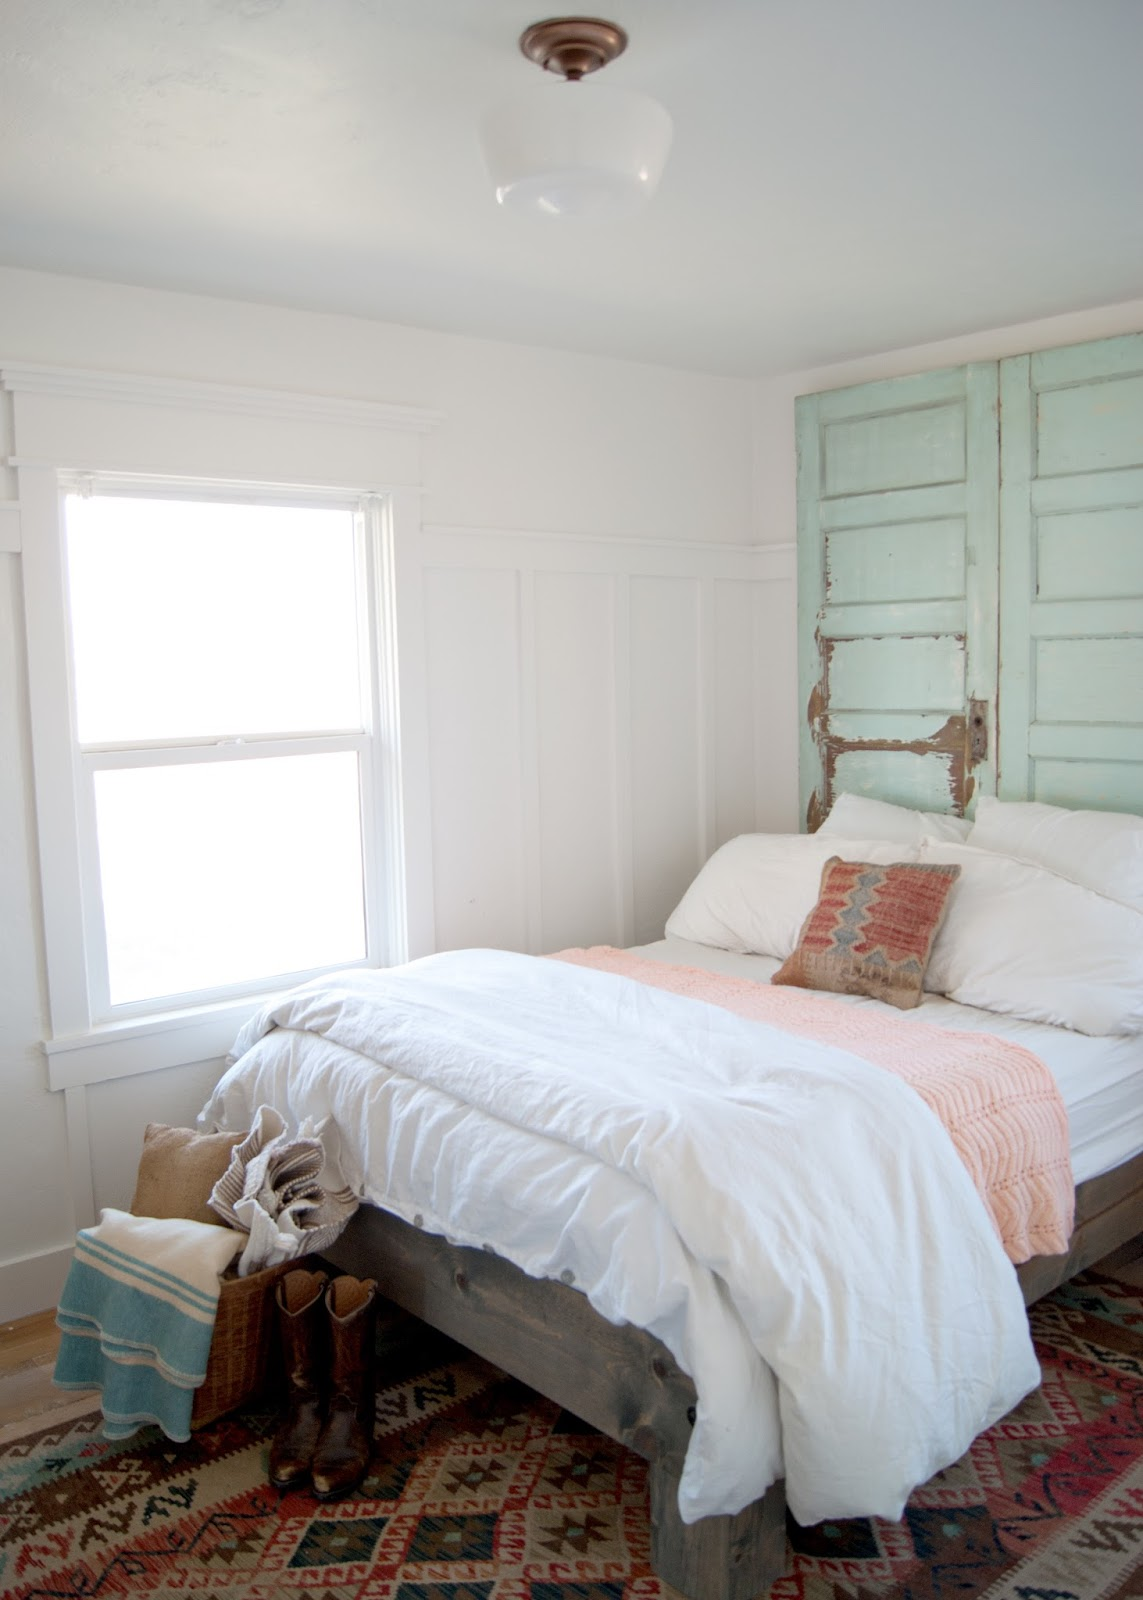 Farmhouse Master Bedroom Reveal One Room Challenge Averie Lane Farmhouse Master Bedroom